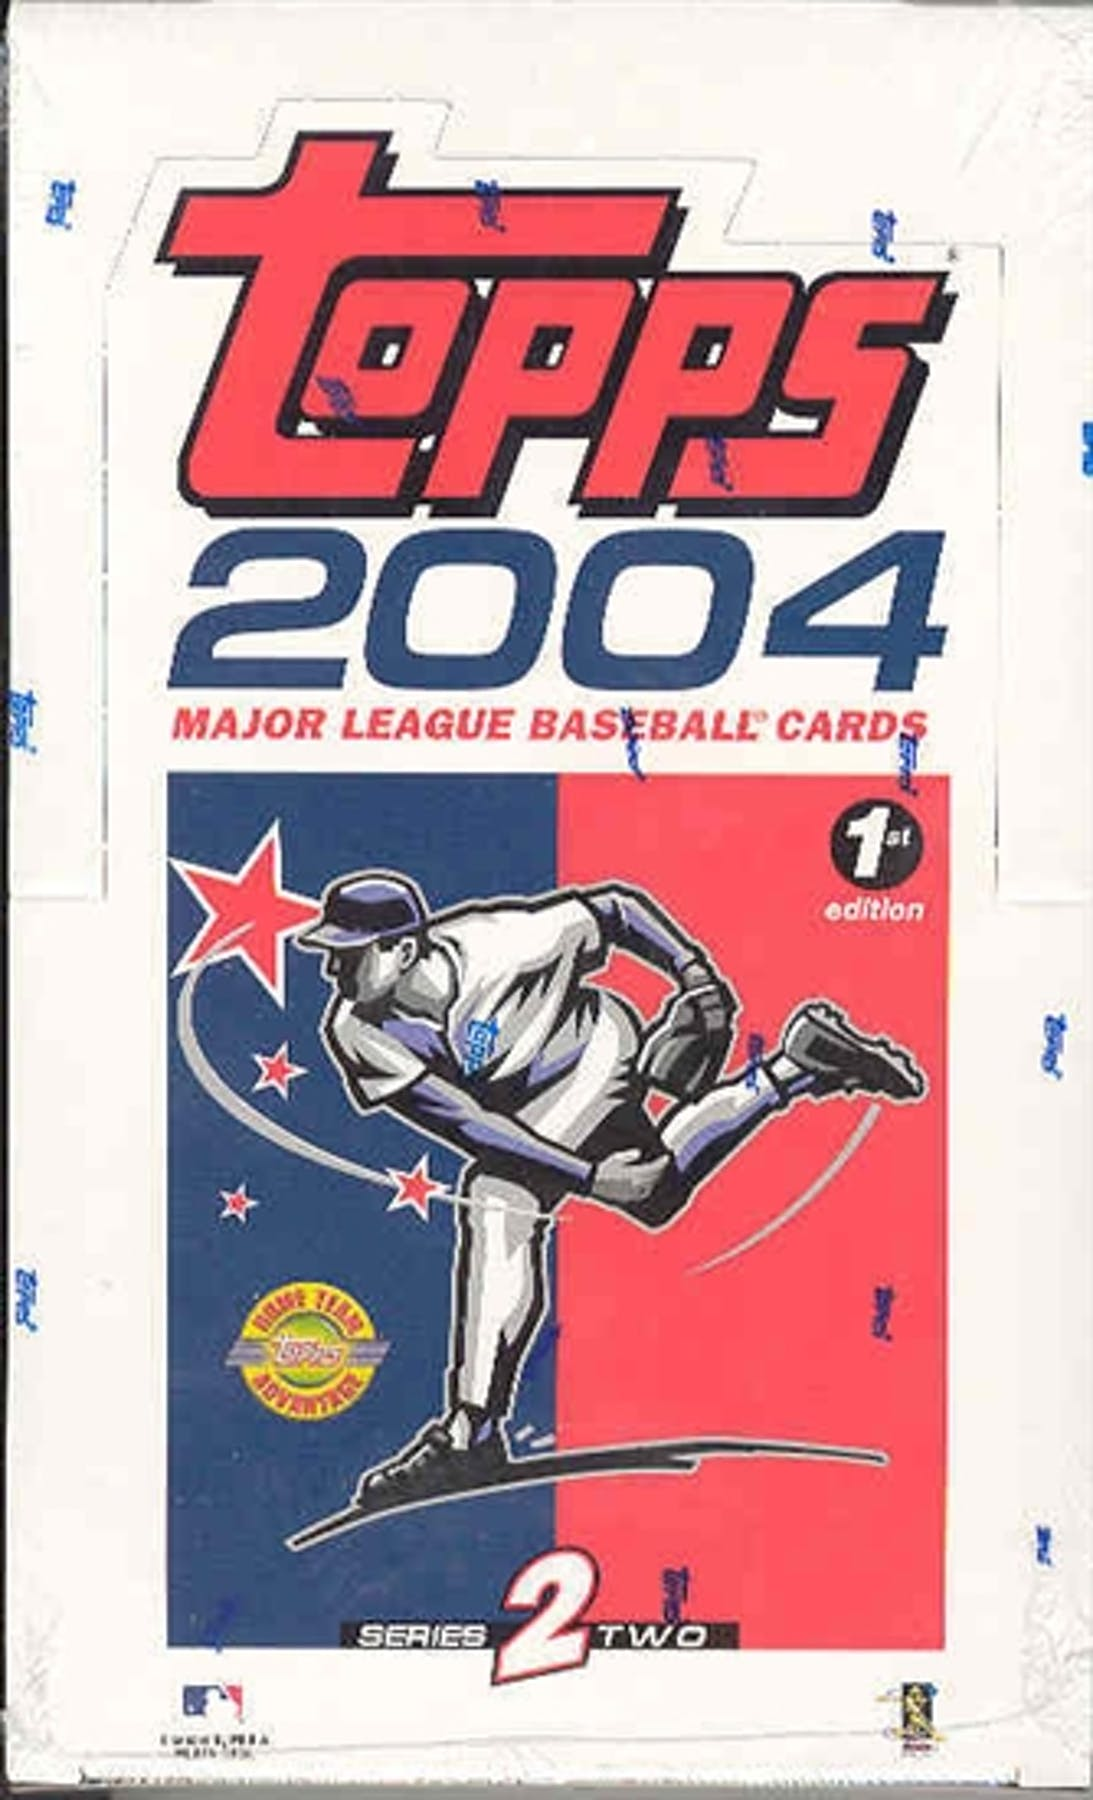 2004 Topps Series 2 First Edition Baseball Hobby Box